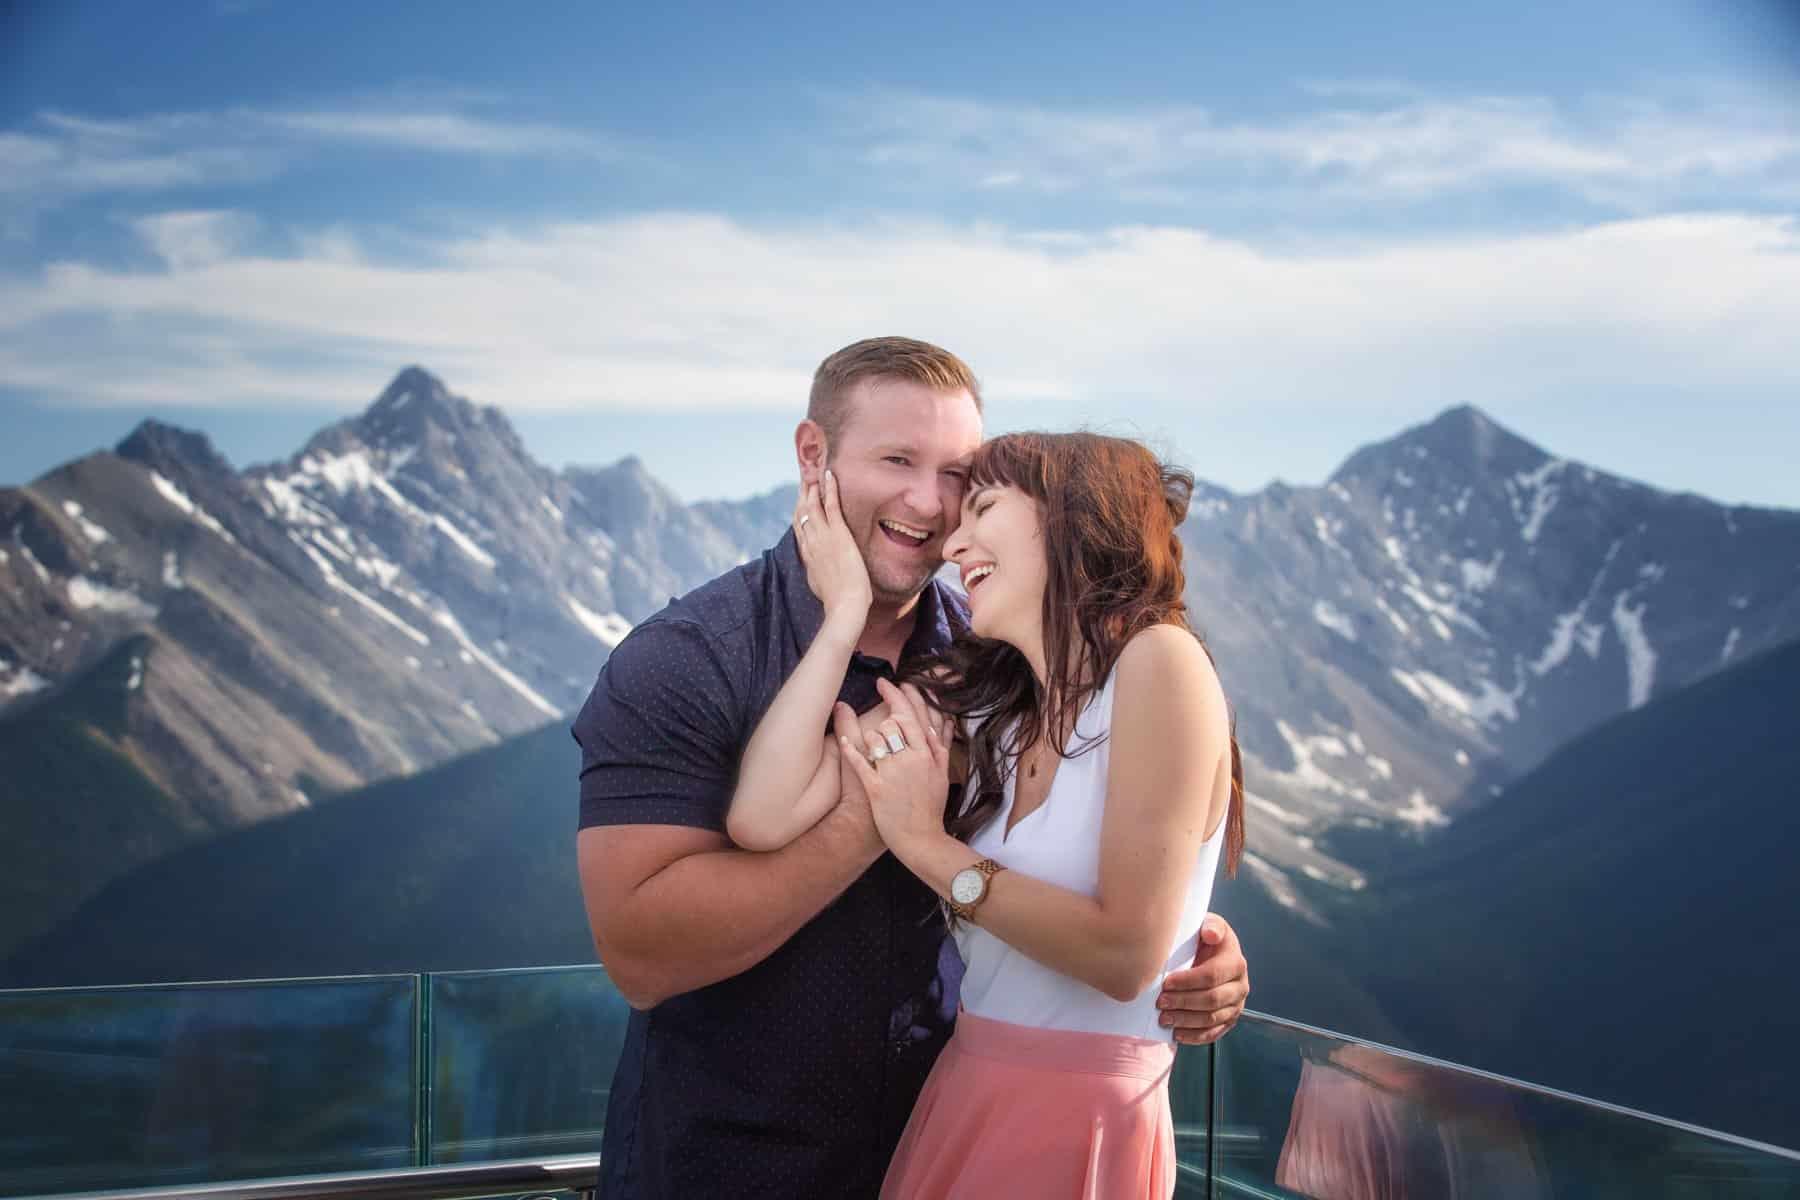 Banff engagement photography at Sulphur Mountain Gondola by Banff photographers, Troy and Shirleen Burnett, Burnett Photography.